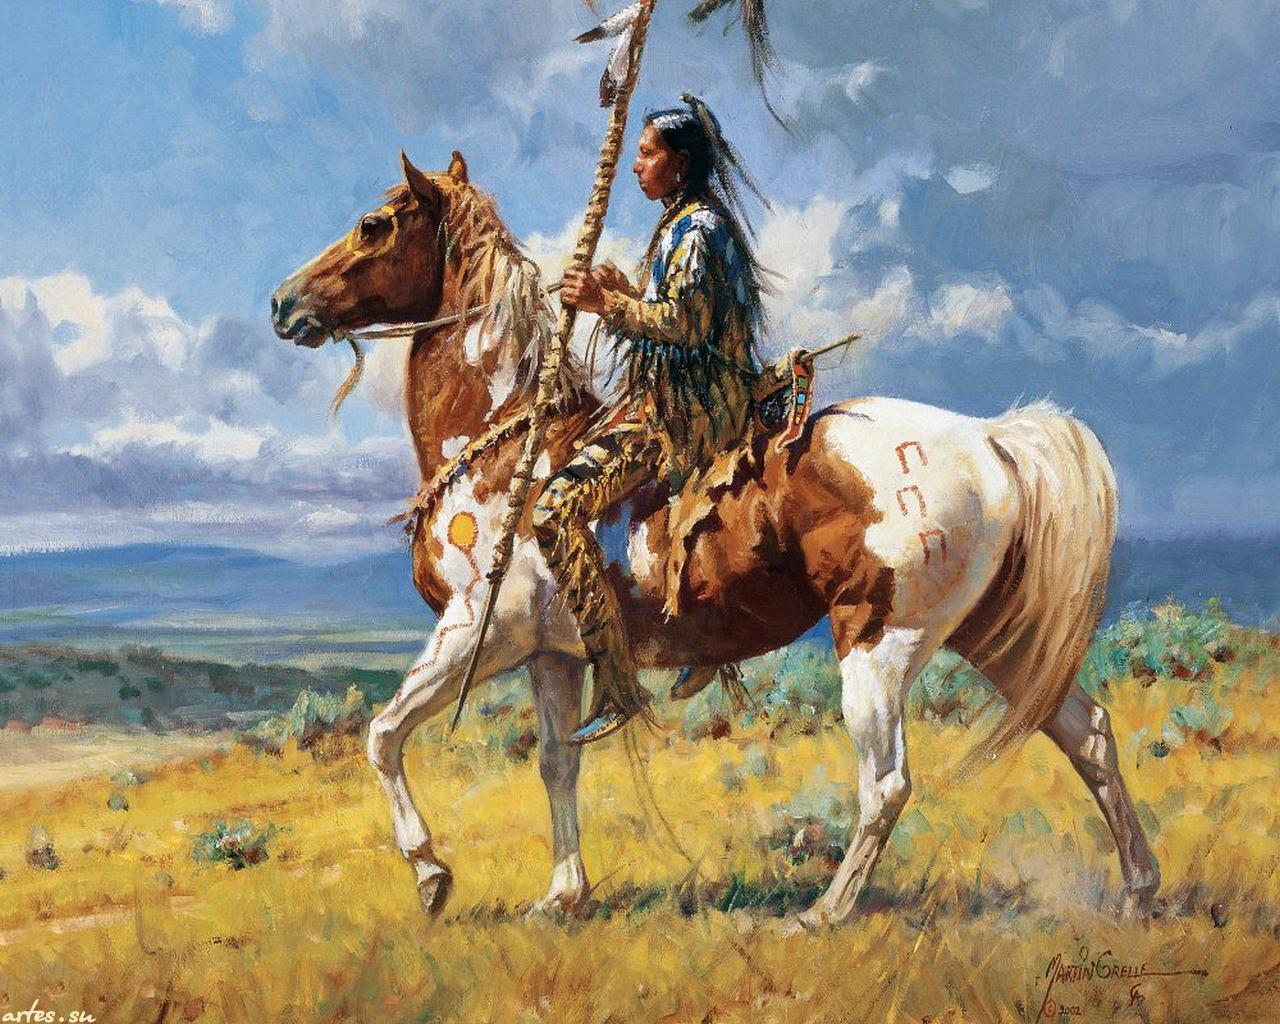 Native American Computer Wallpapers Desktop Backgrounds 1280x1024 1280x1024